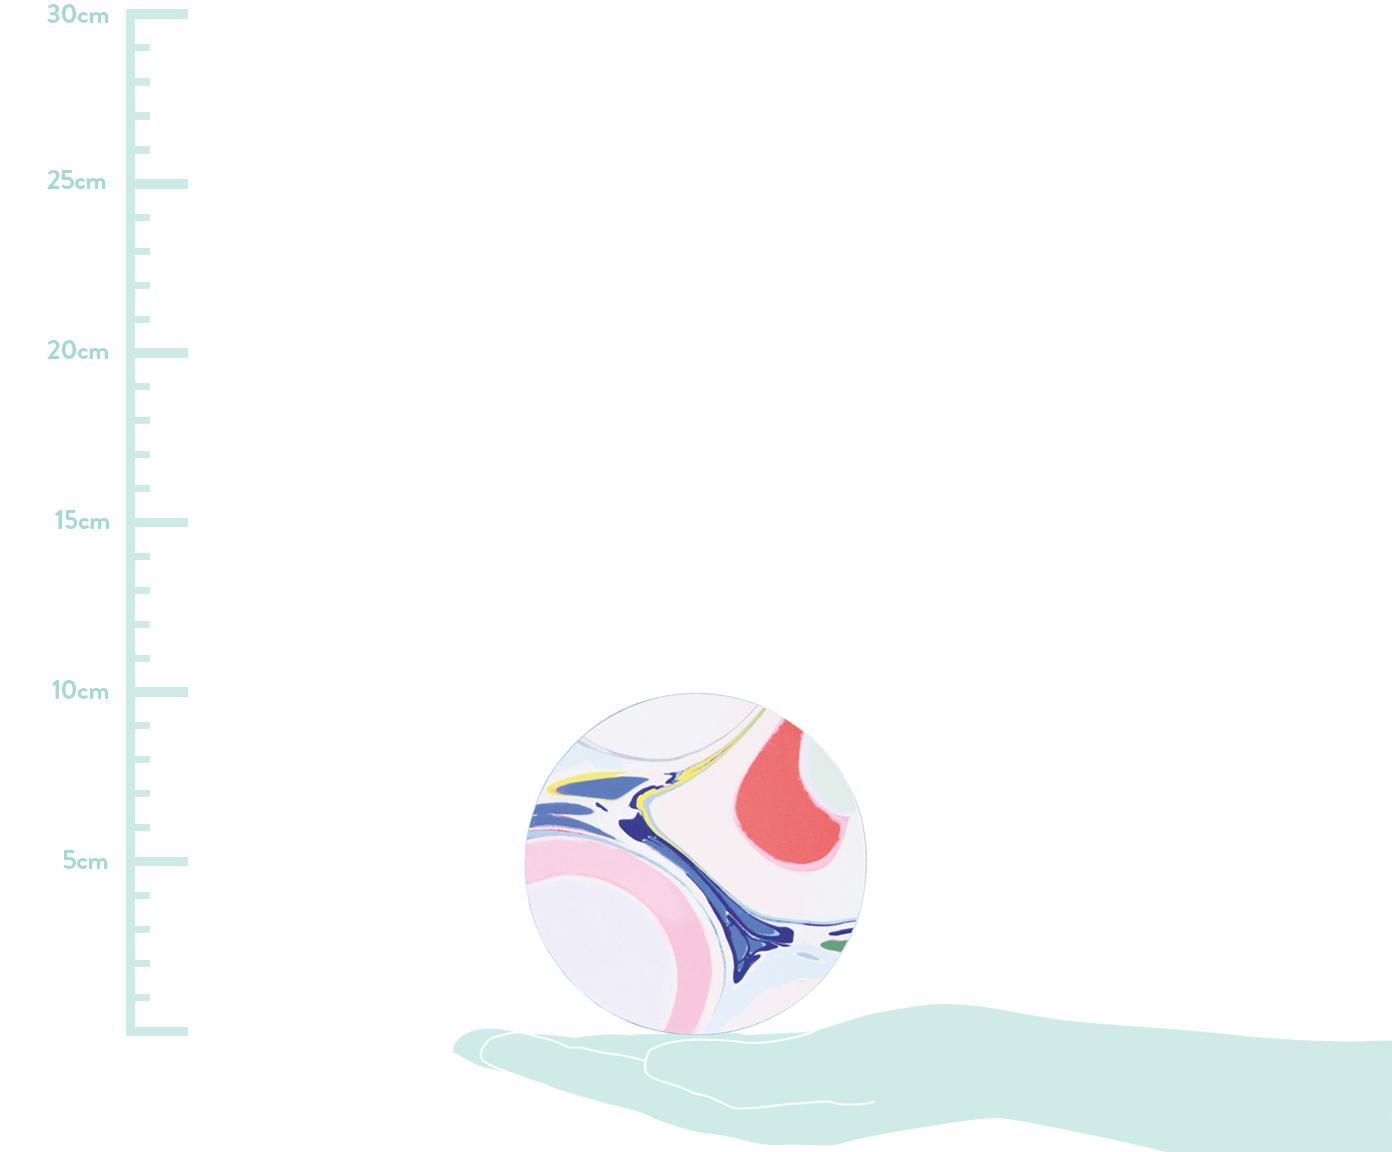 Komplet podstawek z korka Lillian, 6 elem., Korek powlekany, Wielobarwny, Ø 10 cm